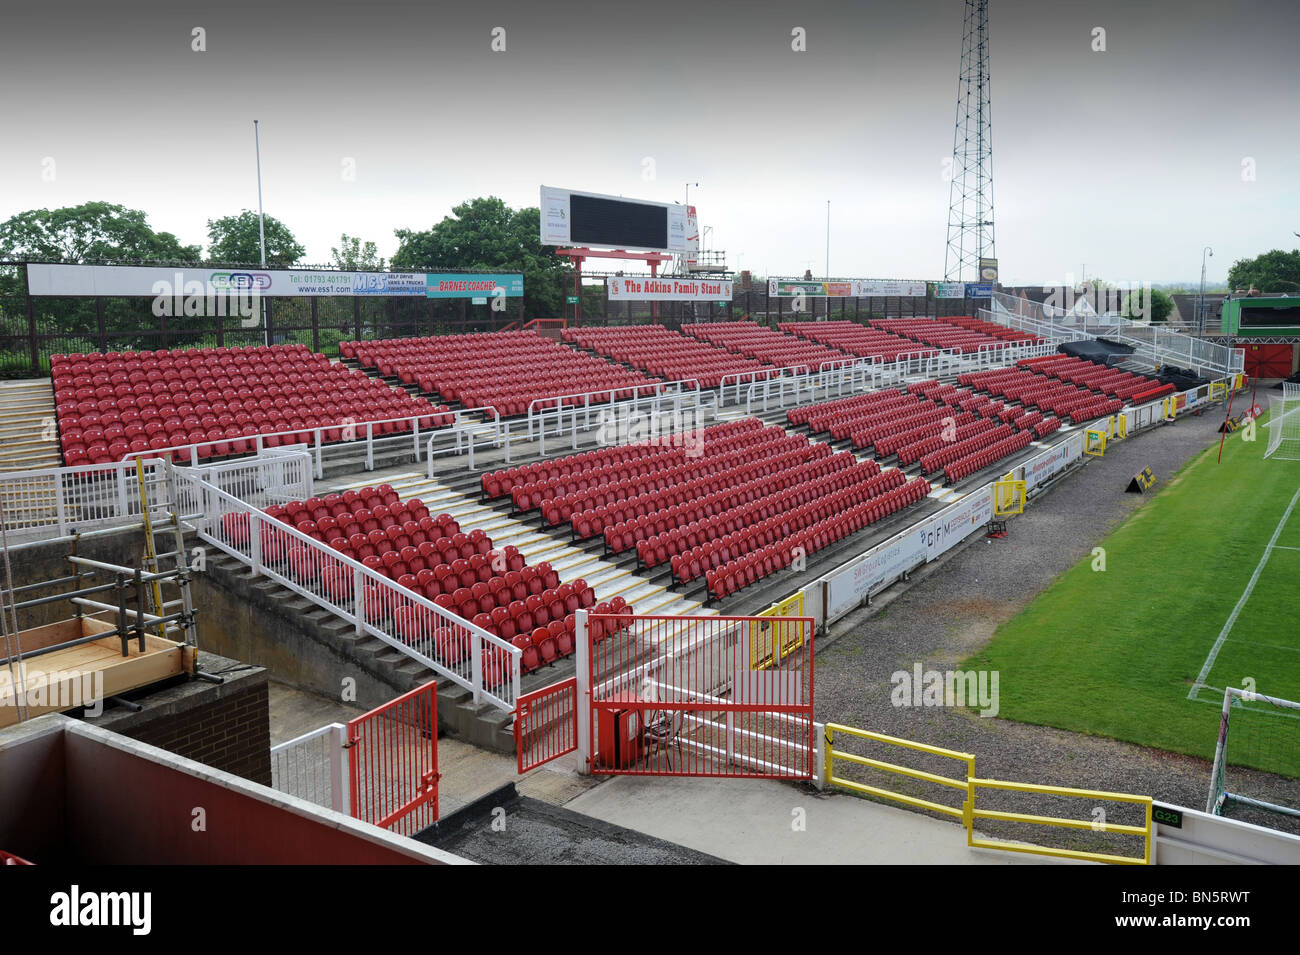 Swindon Town Football Club stadium The County Ground - Stock Image